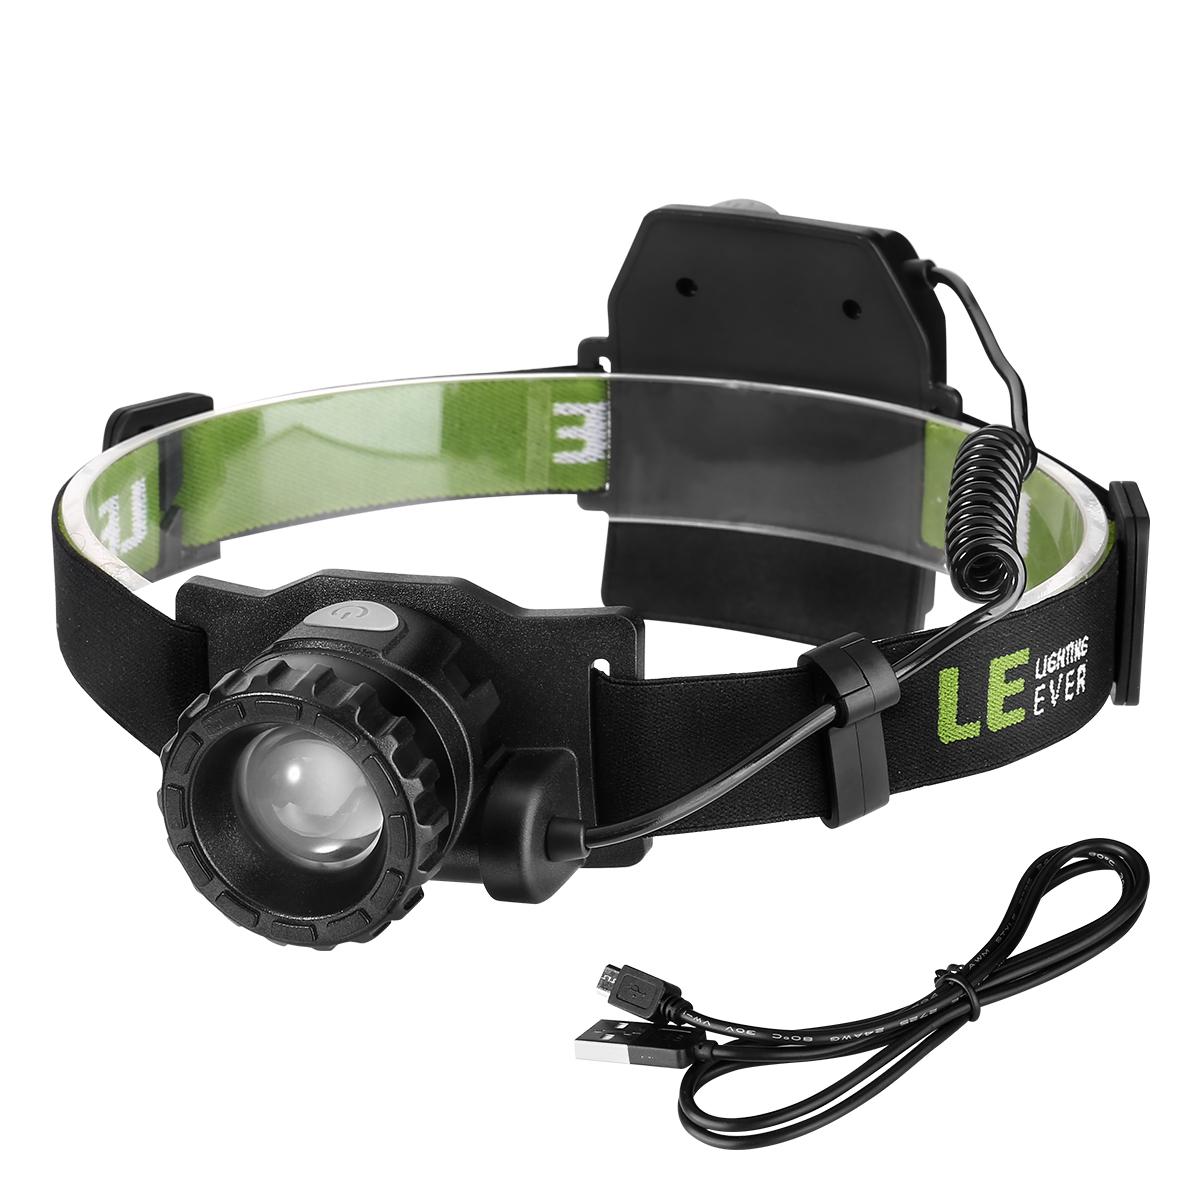 Dimmbar 10W LED Campinglaterne 3 Helligkeiten Campinglampe IP44 Wasserdicht